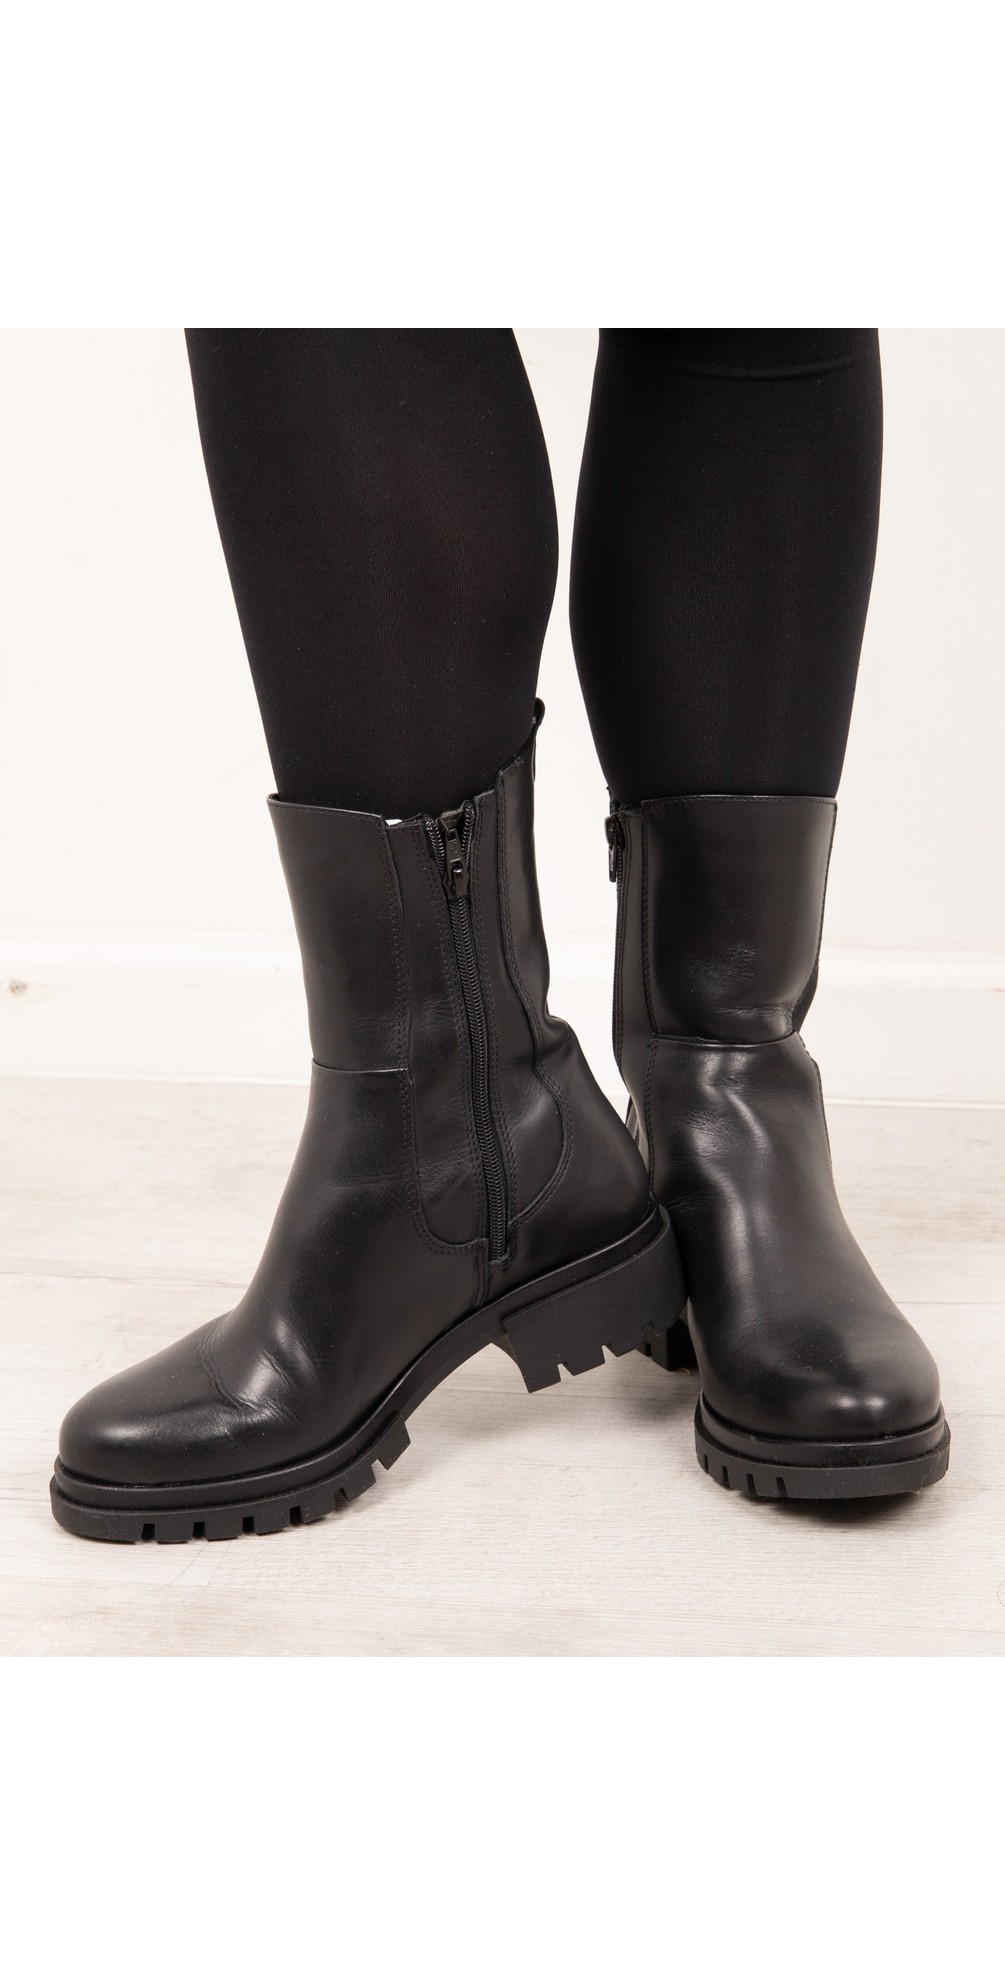 Denize Biker Style Chelsea Boot main image